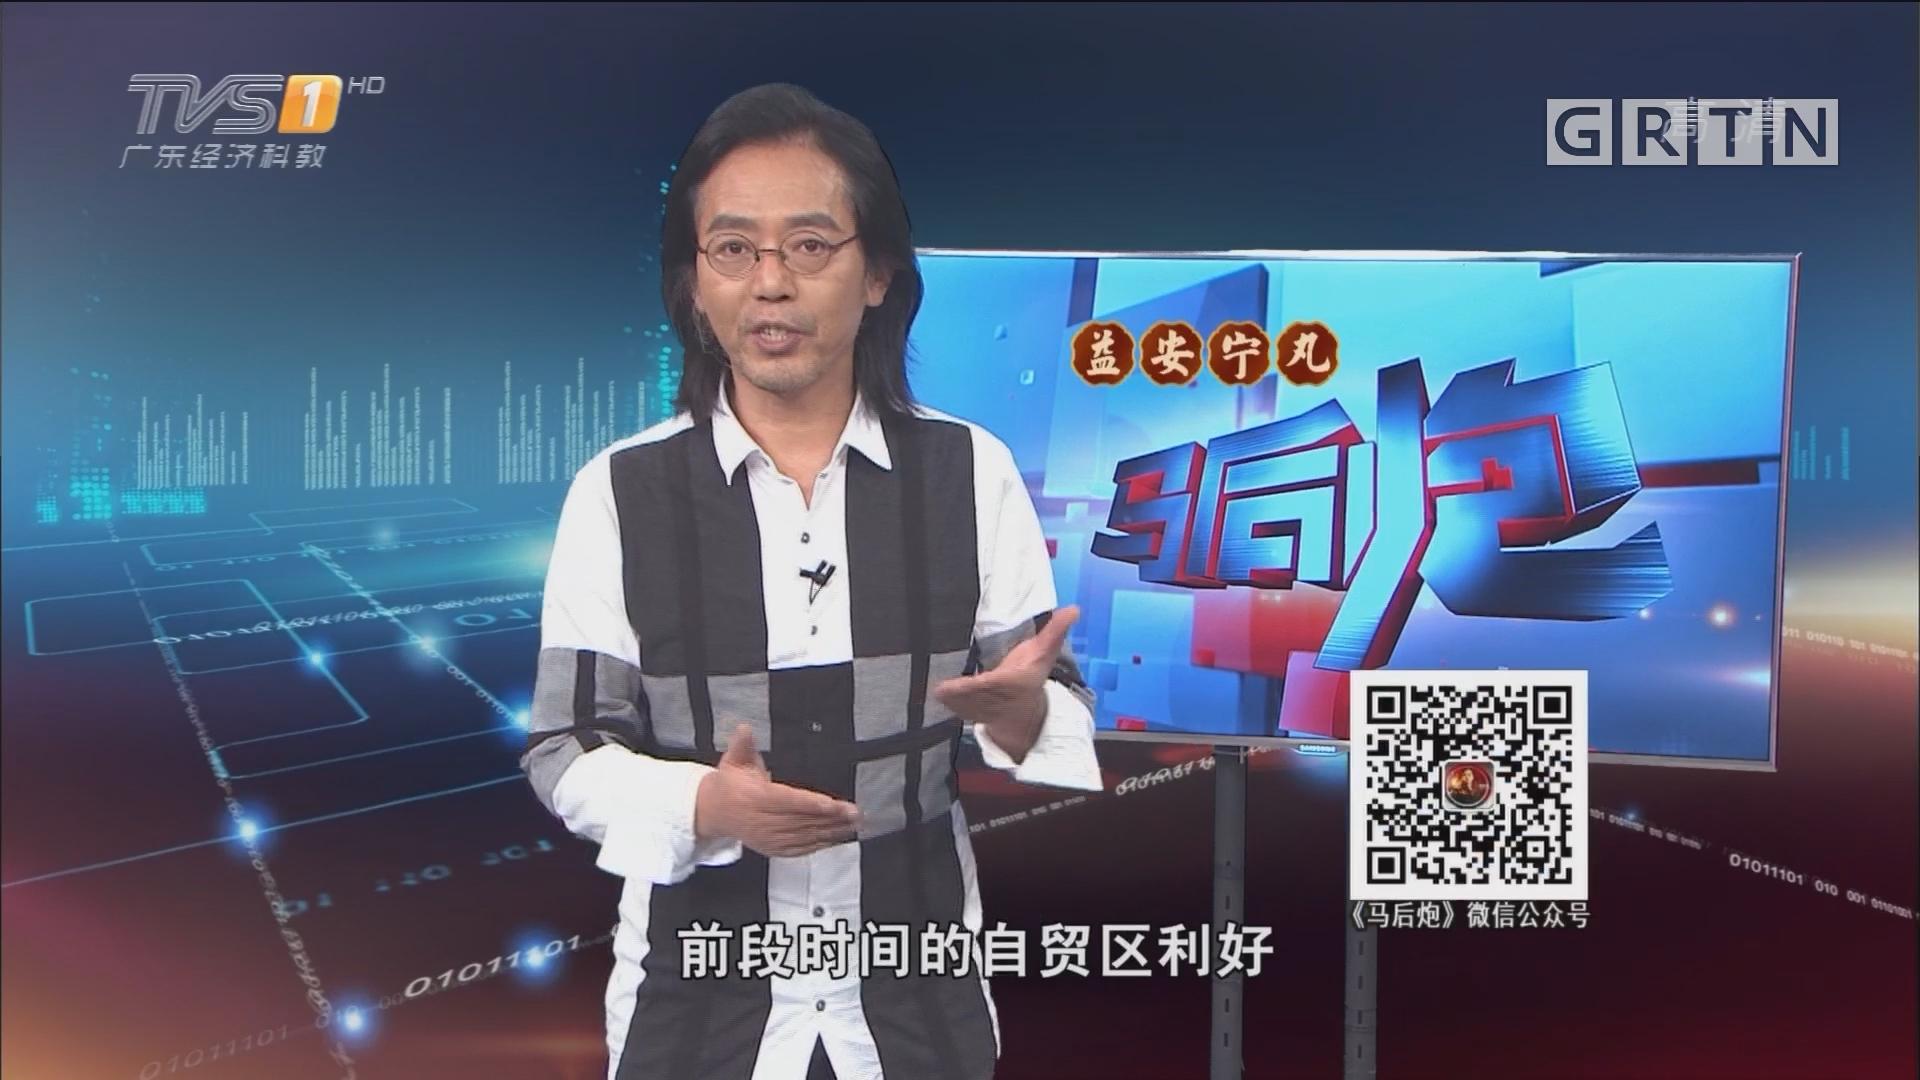 [HD][2018-04-23]马后炮:面对储户权益 银行为何如此傲慢